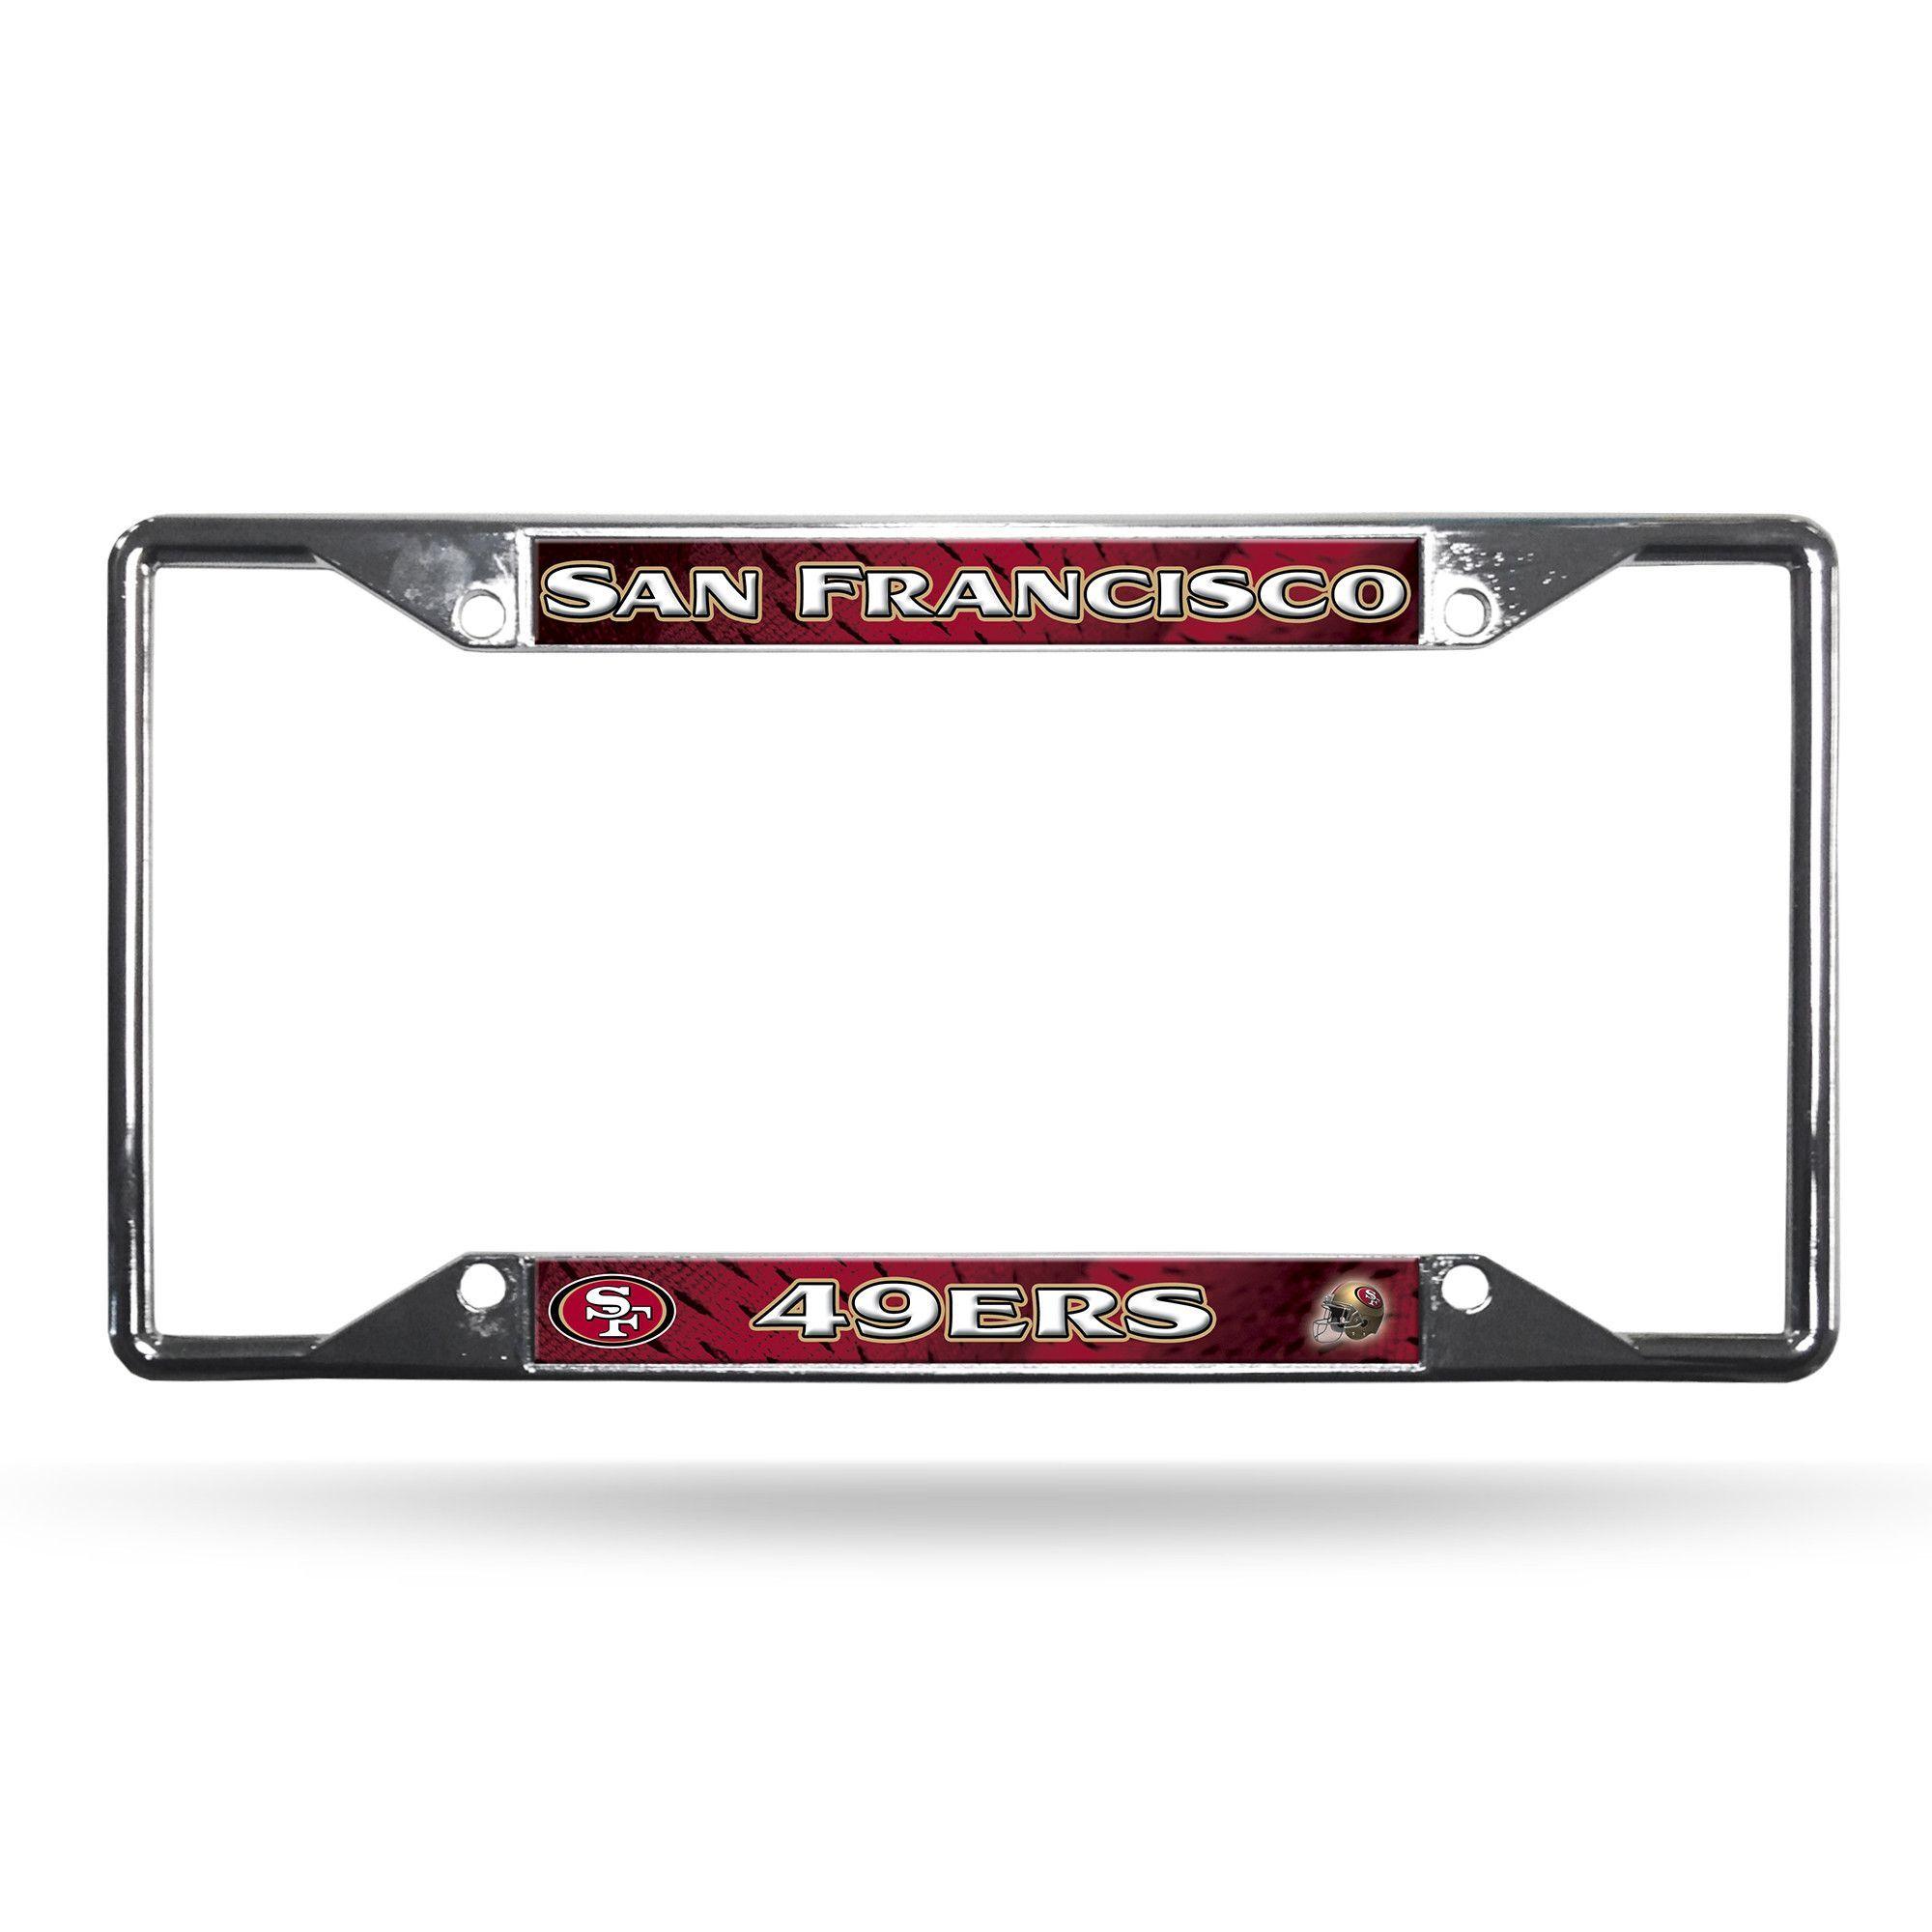 San Francisco 49ers Chrome Easy View License Plate Frame | License ...